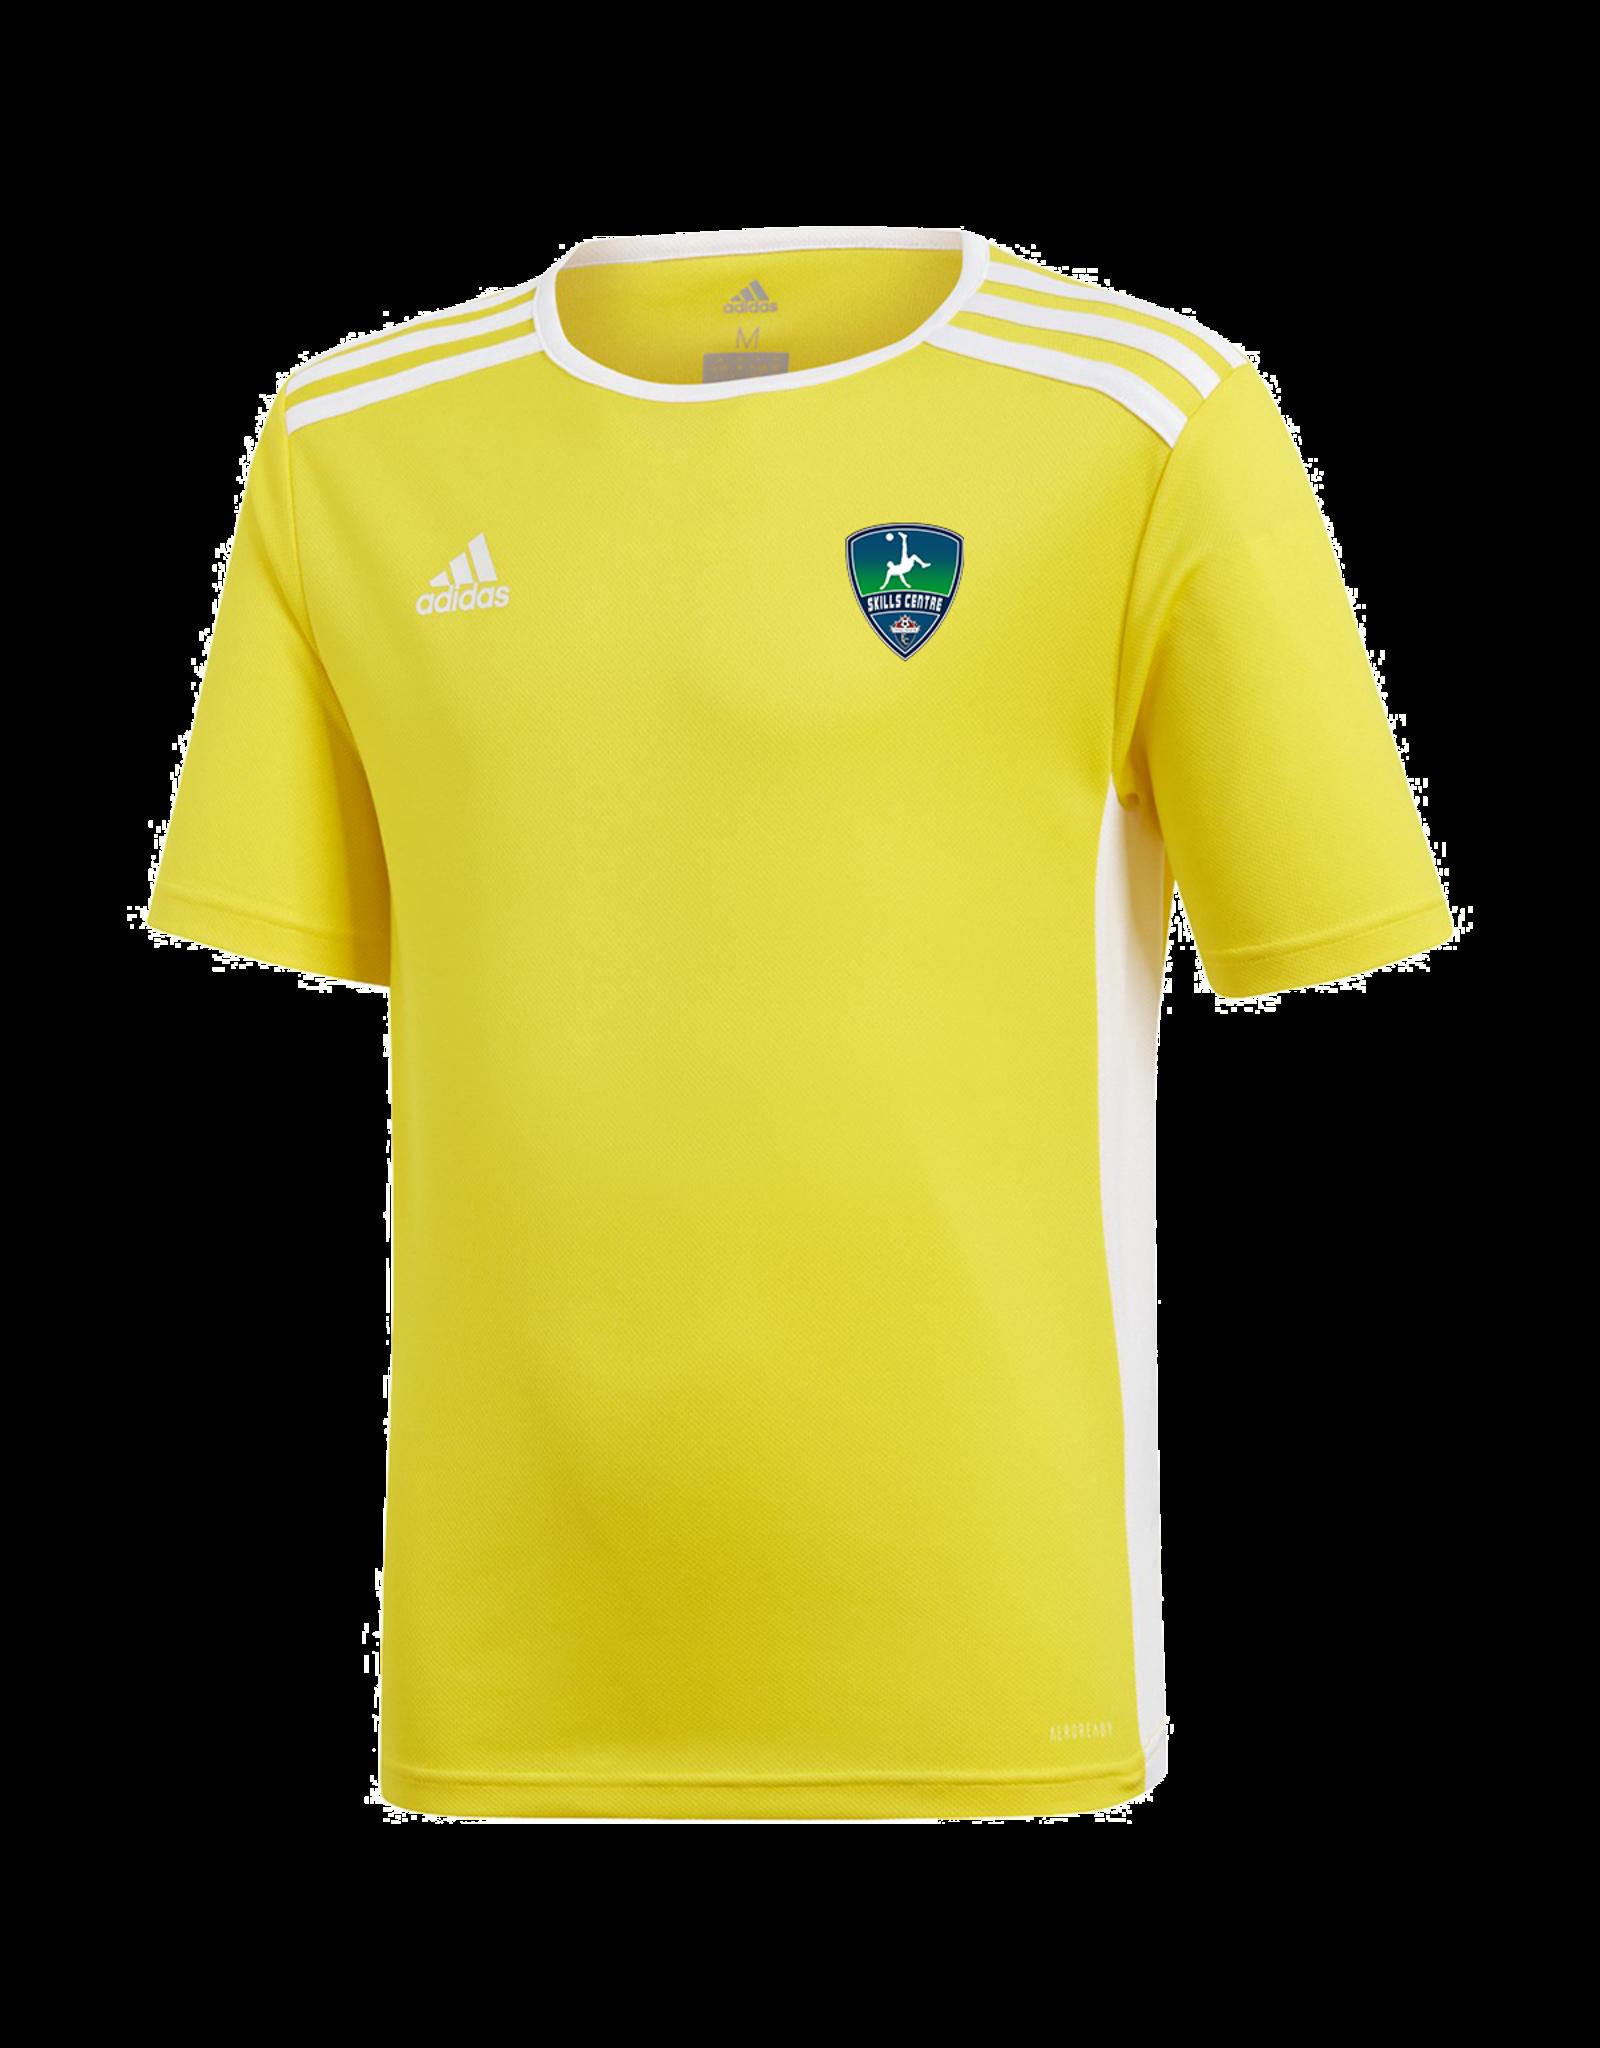 Adidas CFC SKILLS CTR YTH JERSEY